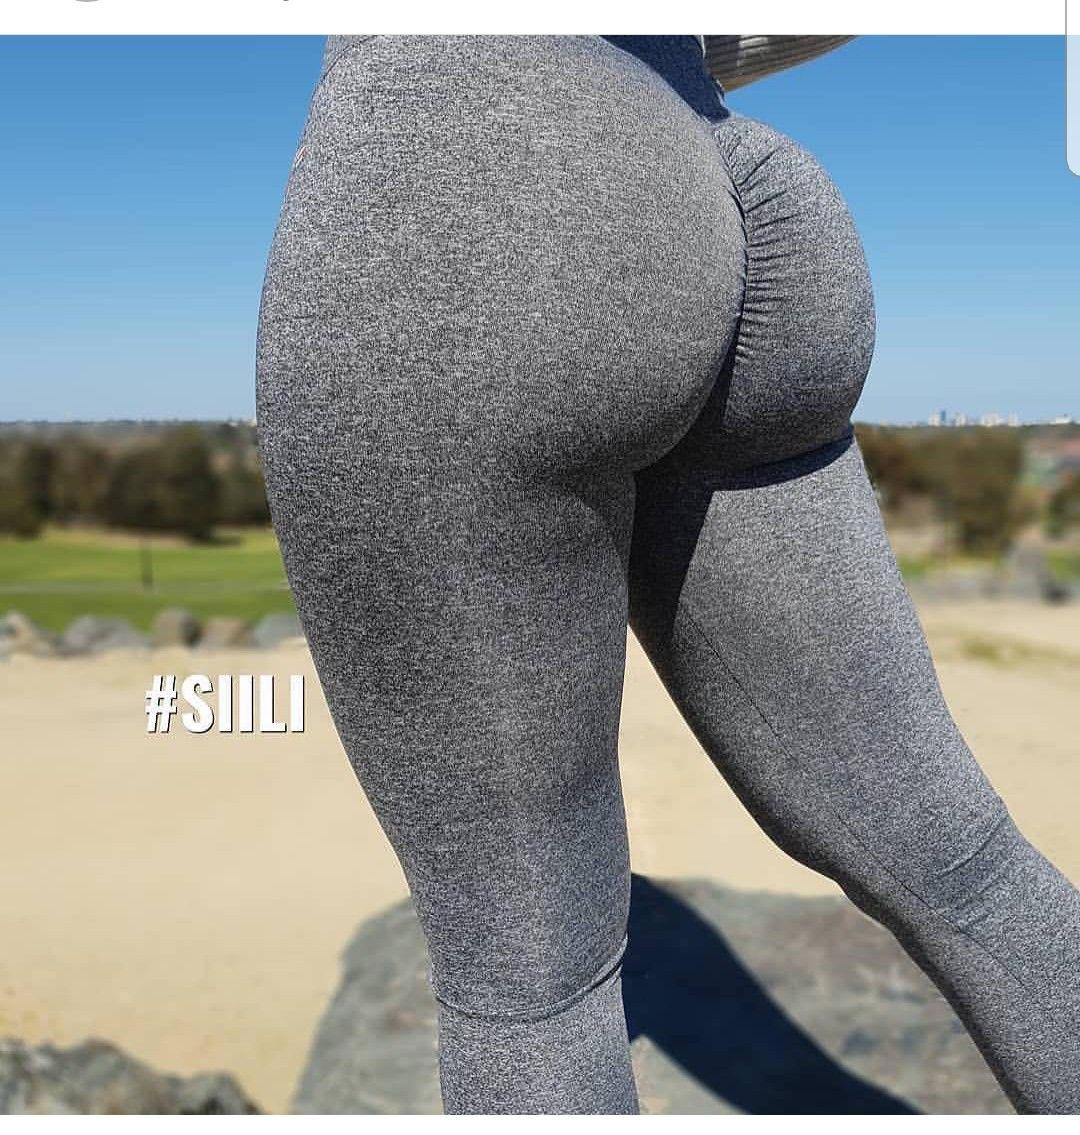 Pin on Ass